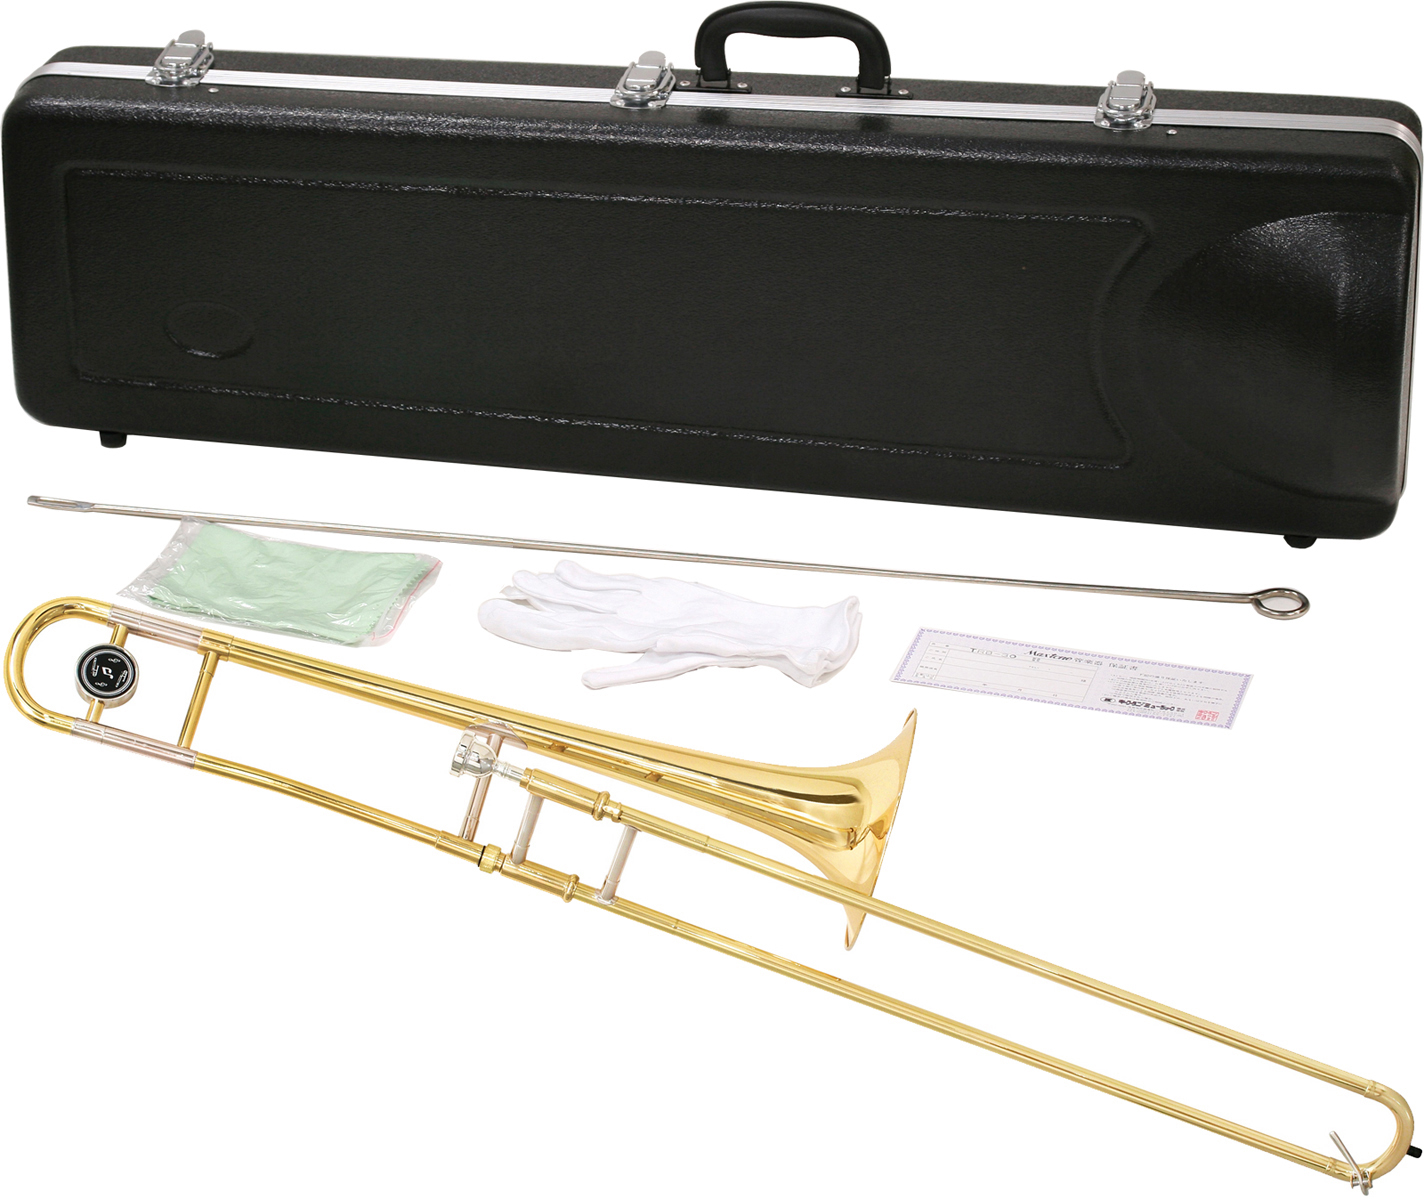 MAXTONE ( マックストーン ) トロンボーン TRB-30 新品 細管 B♭ テナートロンボーン 8インチベル 本体 初心者 管楽器 TRB30 Tenor trombone 一部送料追加 送料無料(北海道/沖縄/離島不可)